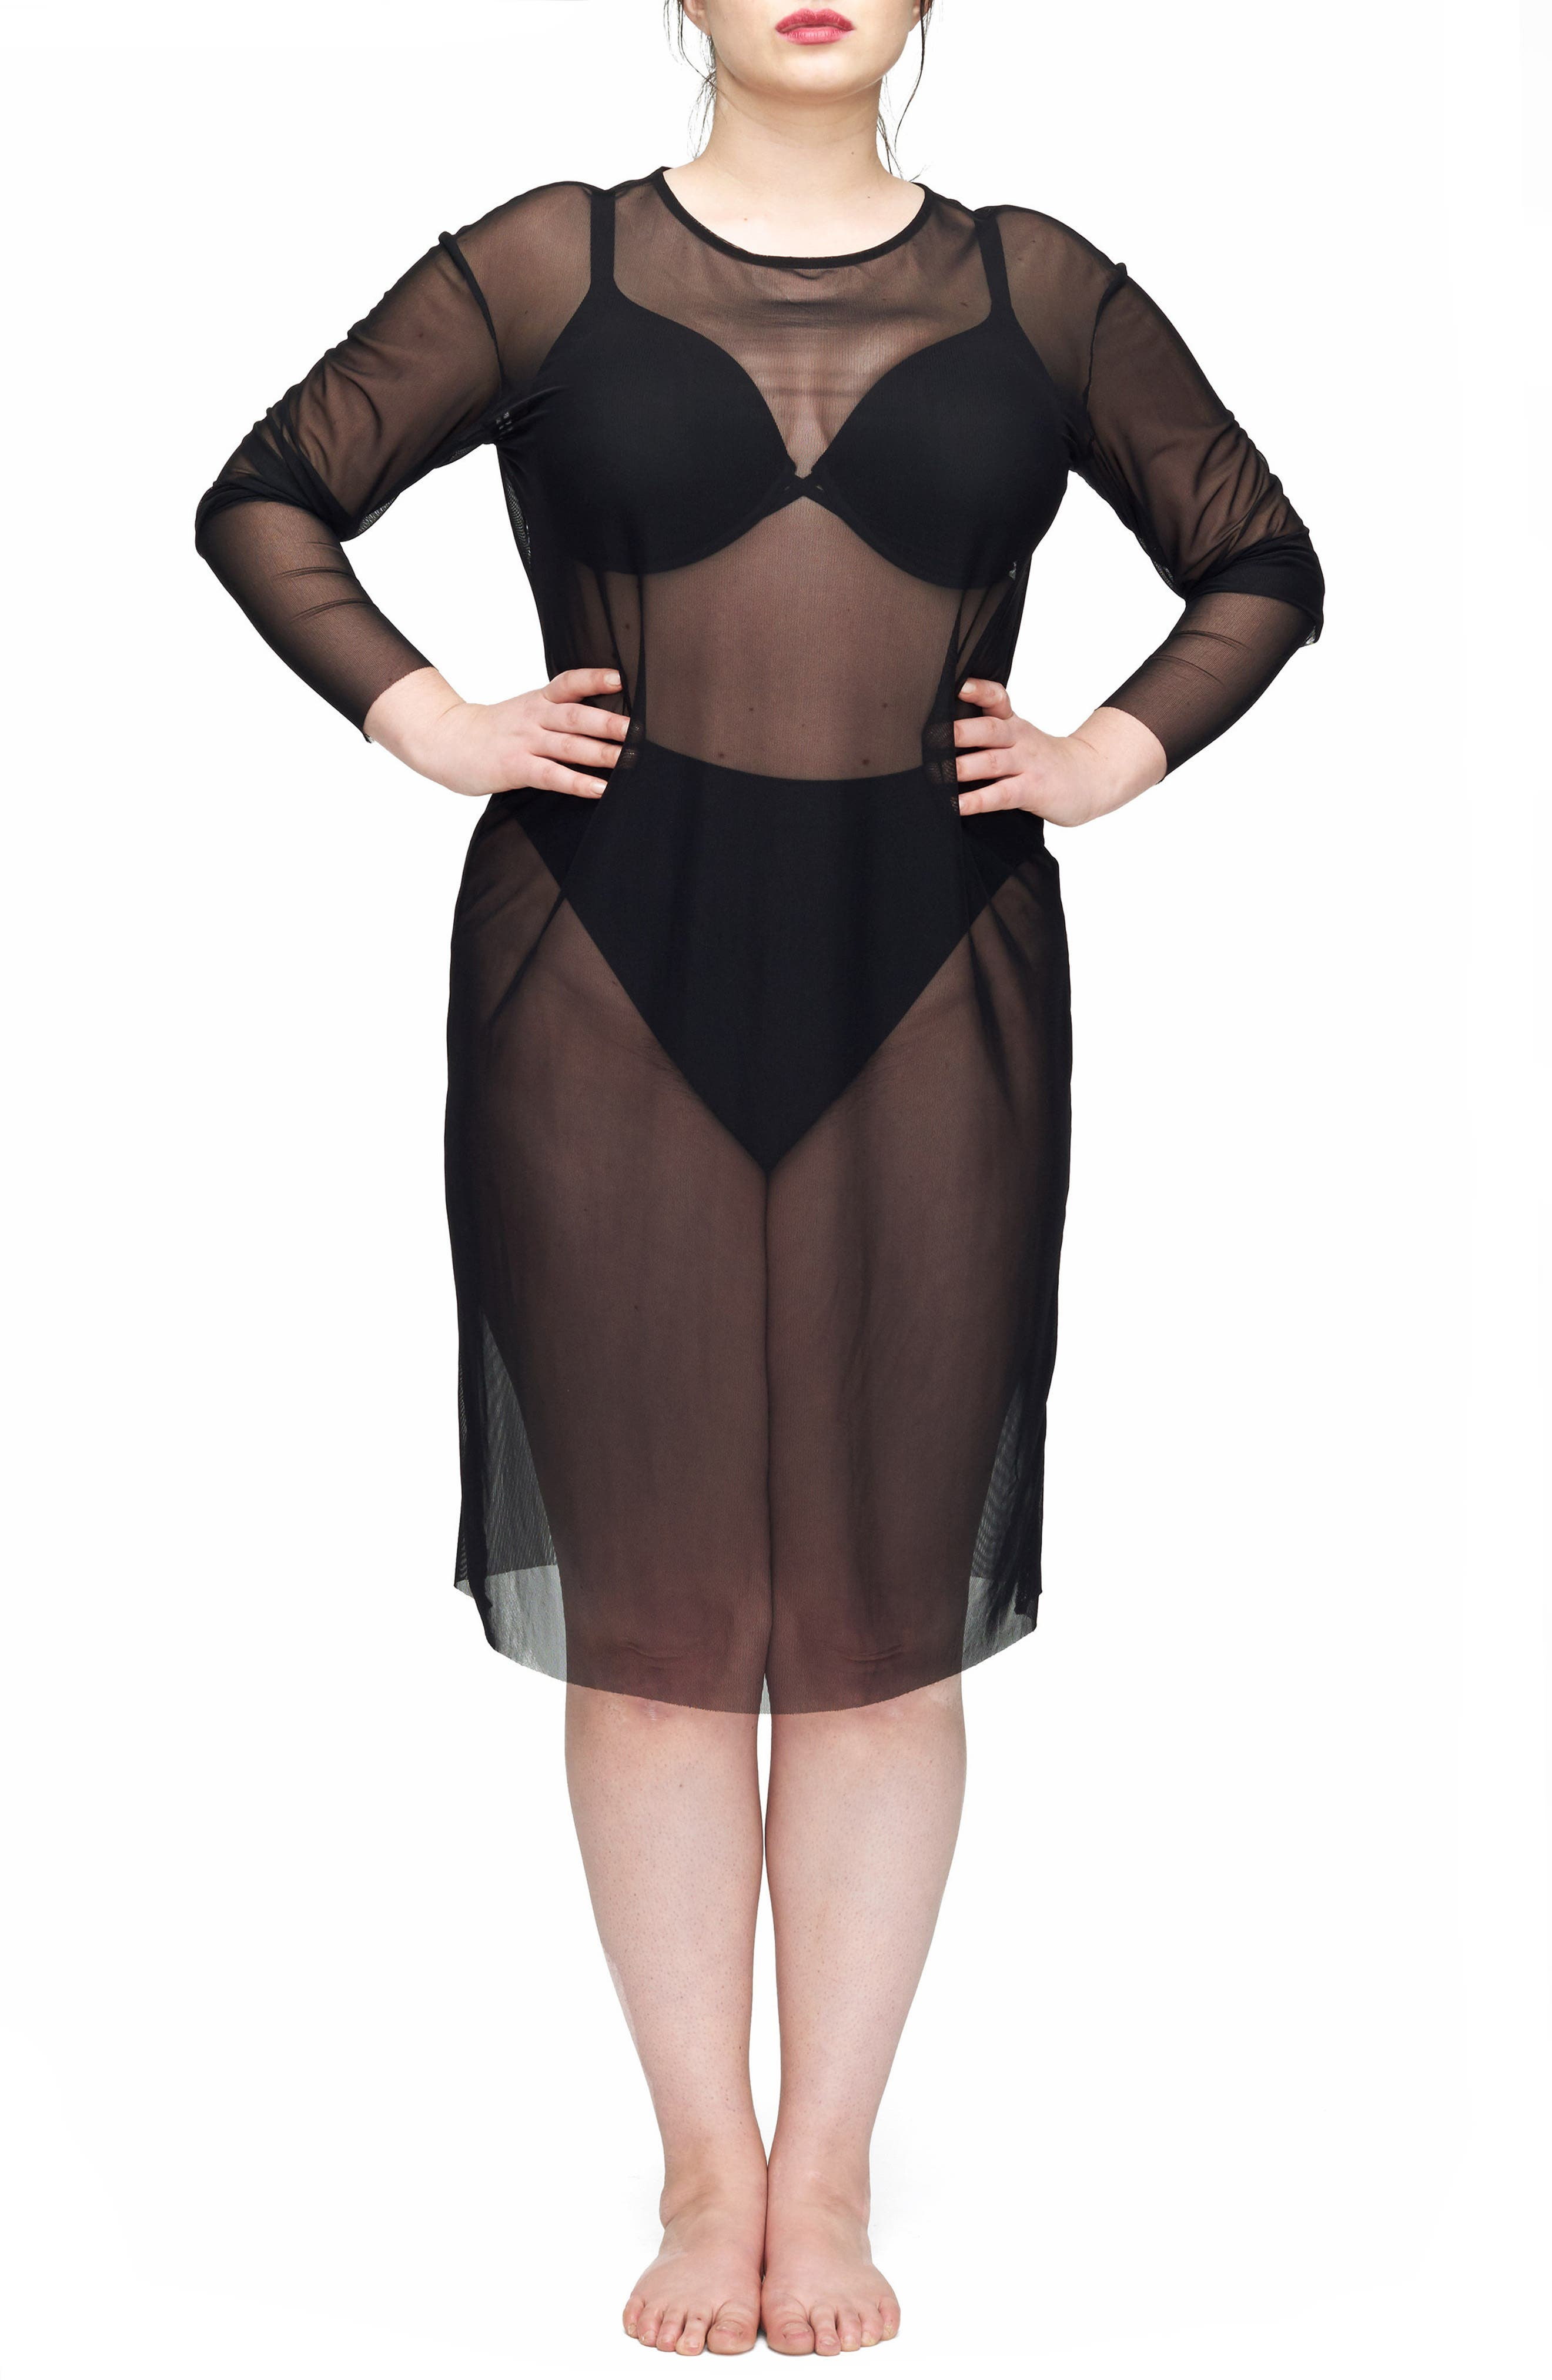 Alternate Image 1 Selected - UNIVERSAL STANDARD Thames Fog Sheer Dress (Plus Size)